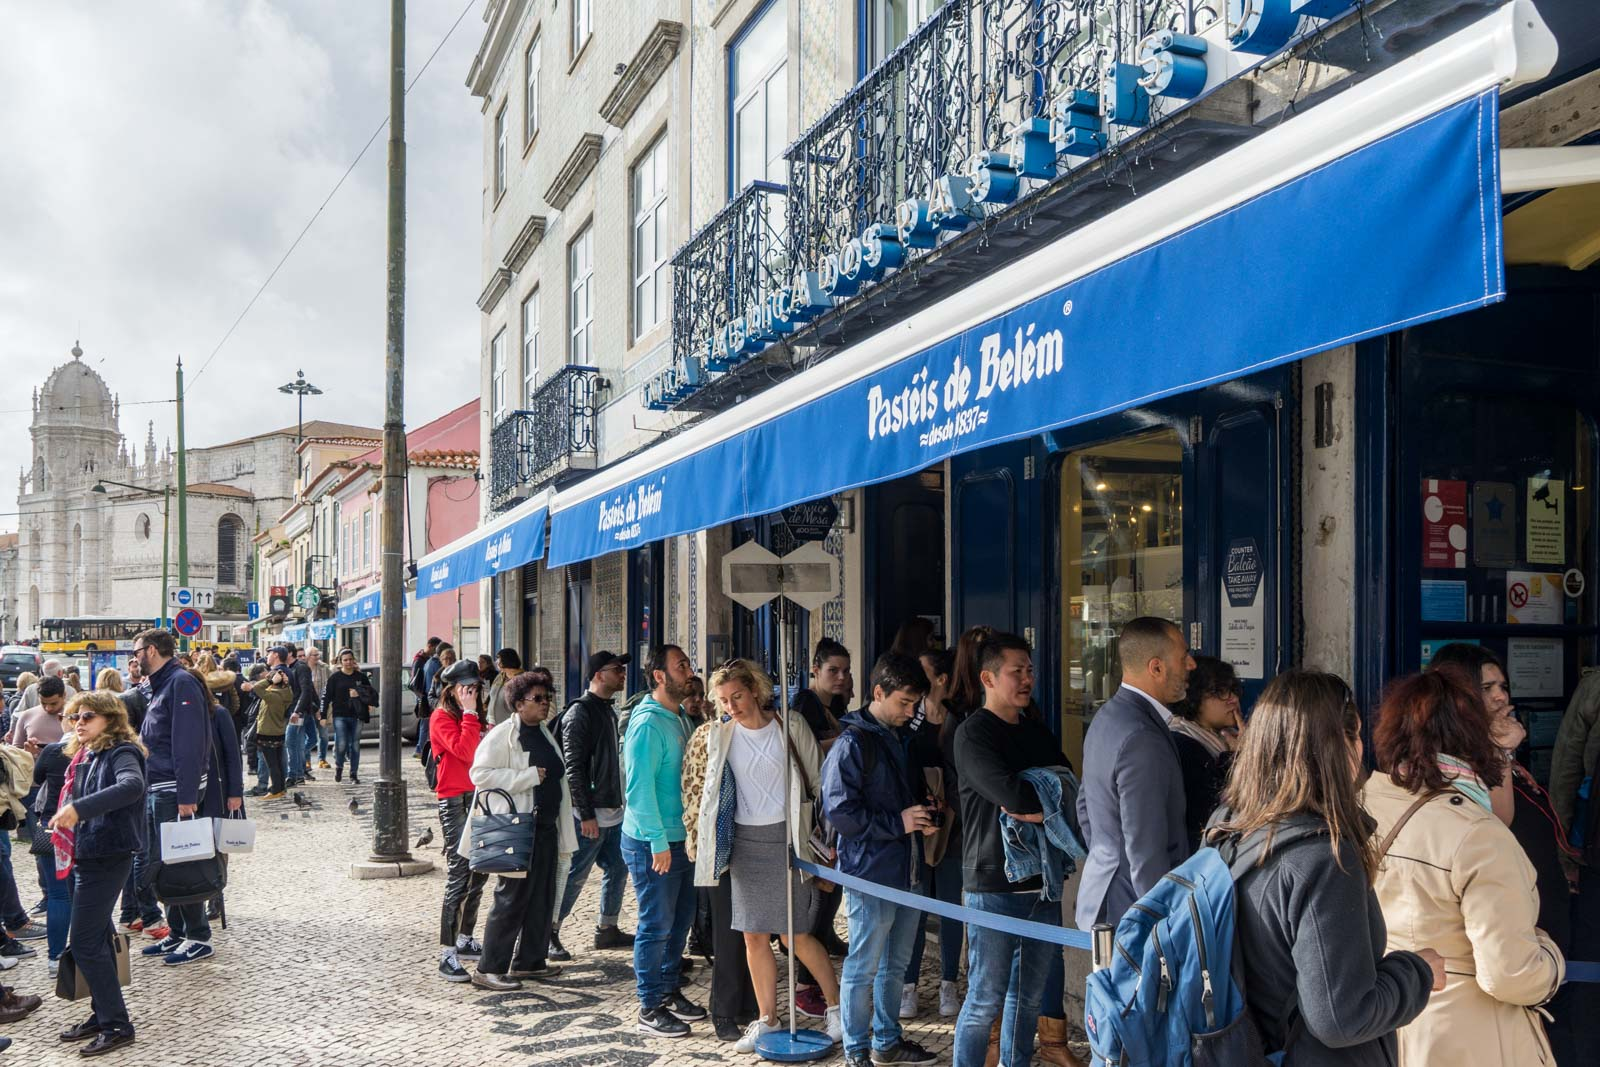 Pastéis de Belém, Belem, Lisbon, Portugal